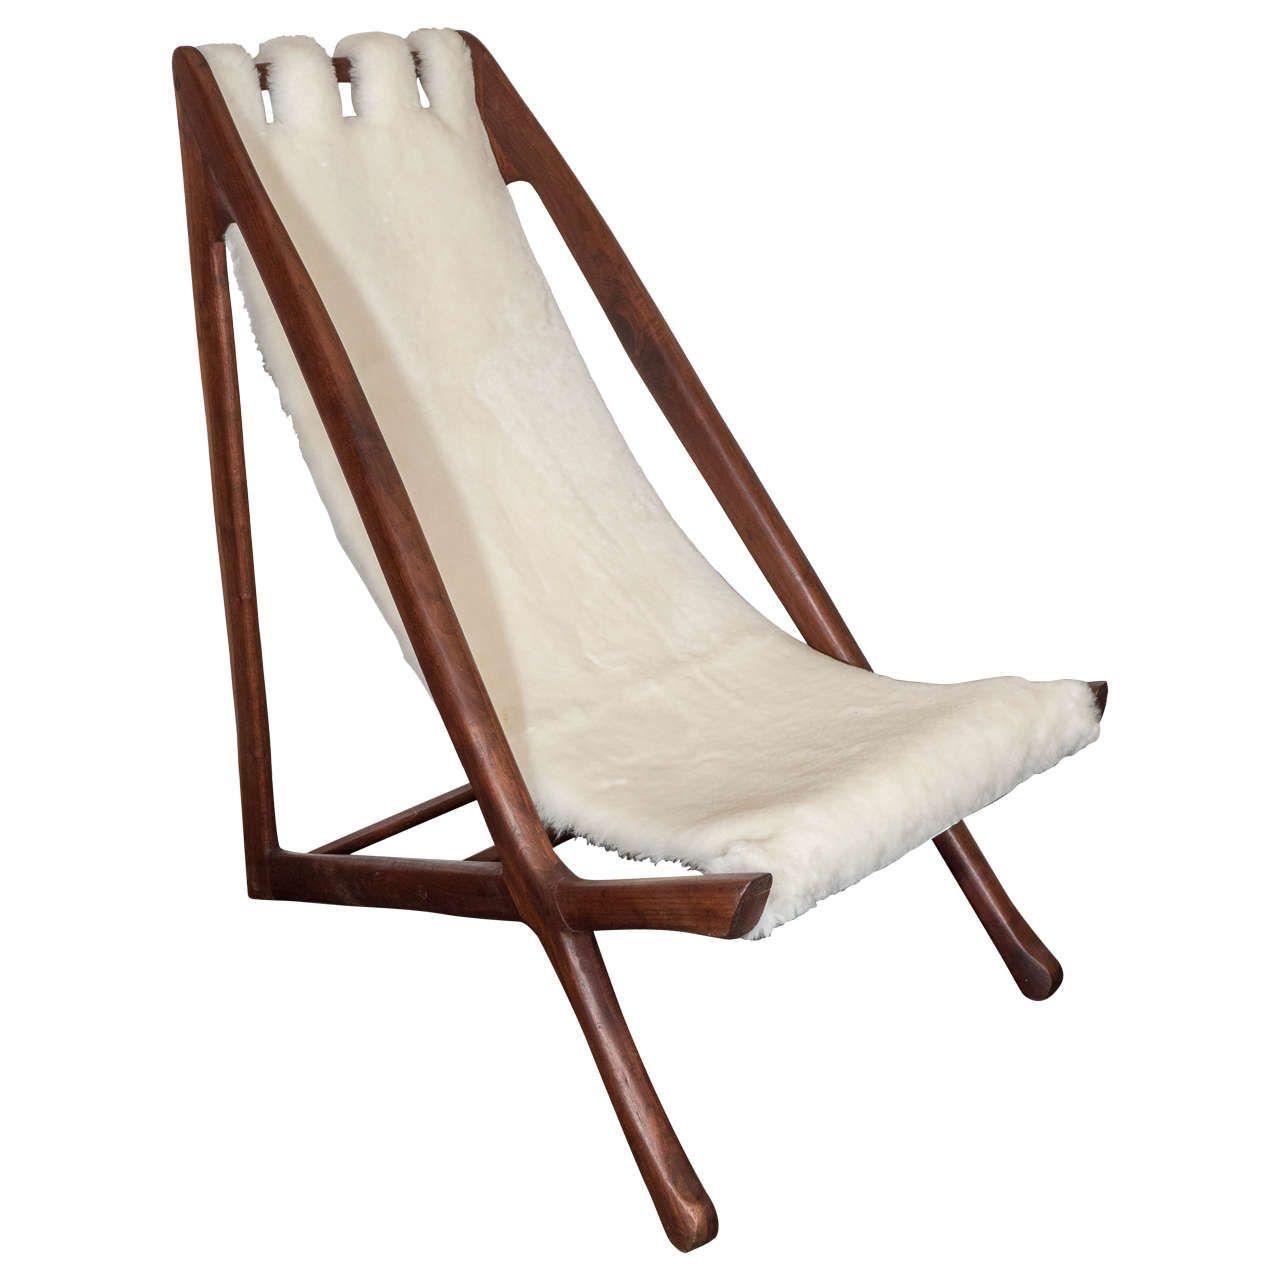 A Scandinavian Midcentury Modern Sling Chair With Sheepskin Upholstery